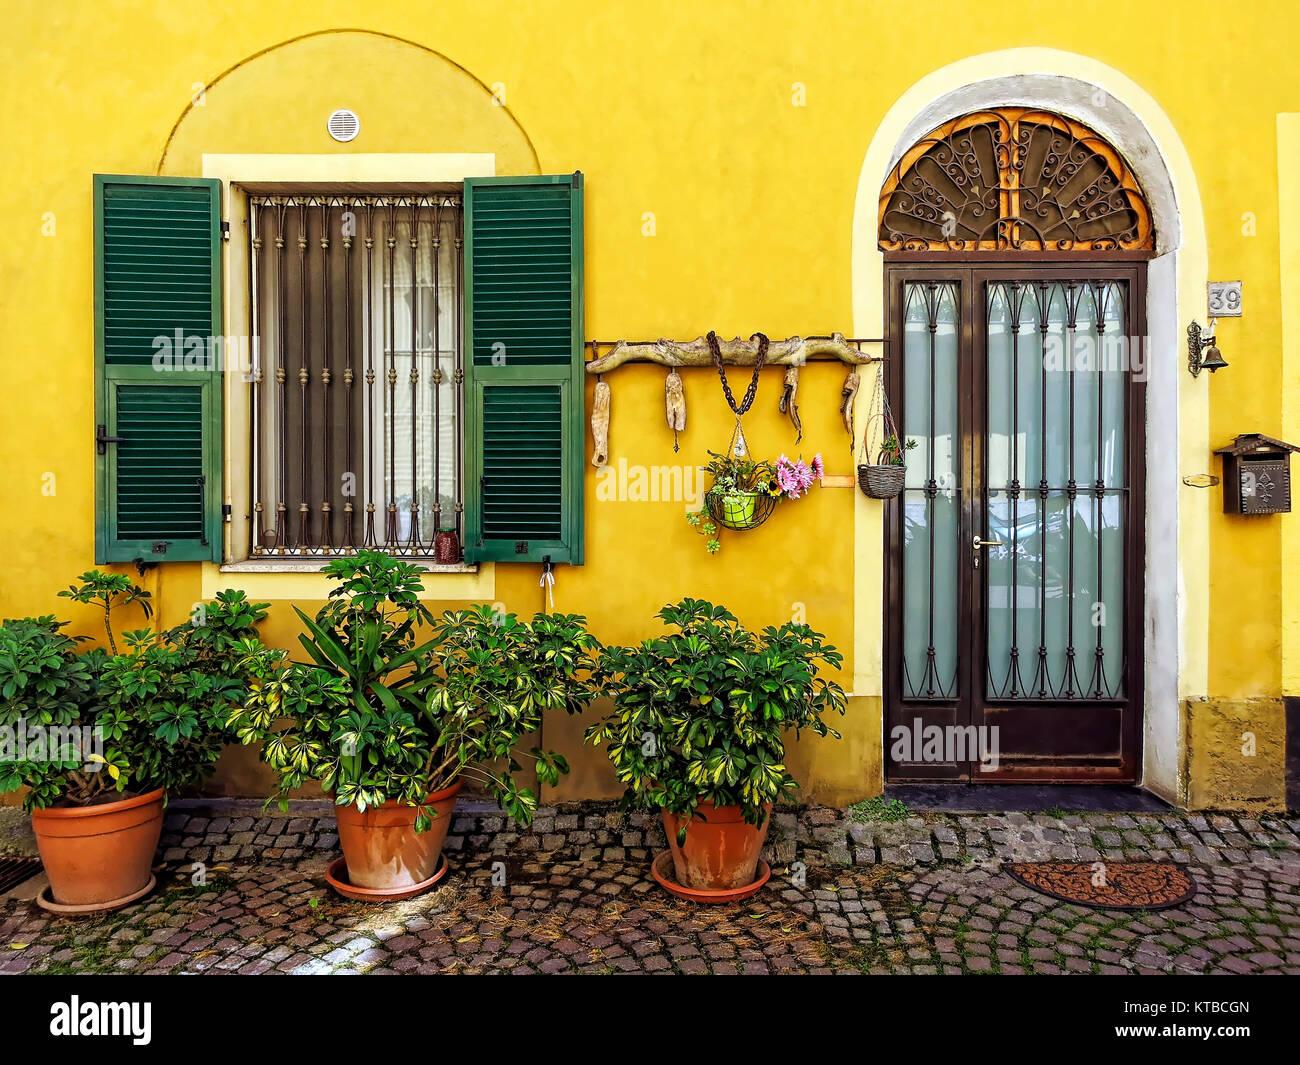 Gelbe Hausfassade In Badalucco Stock Photo 169896405 Alamy